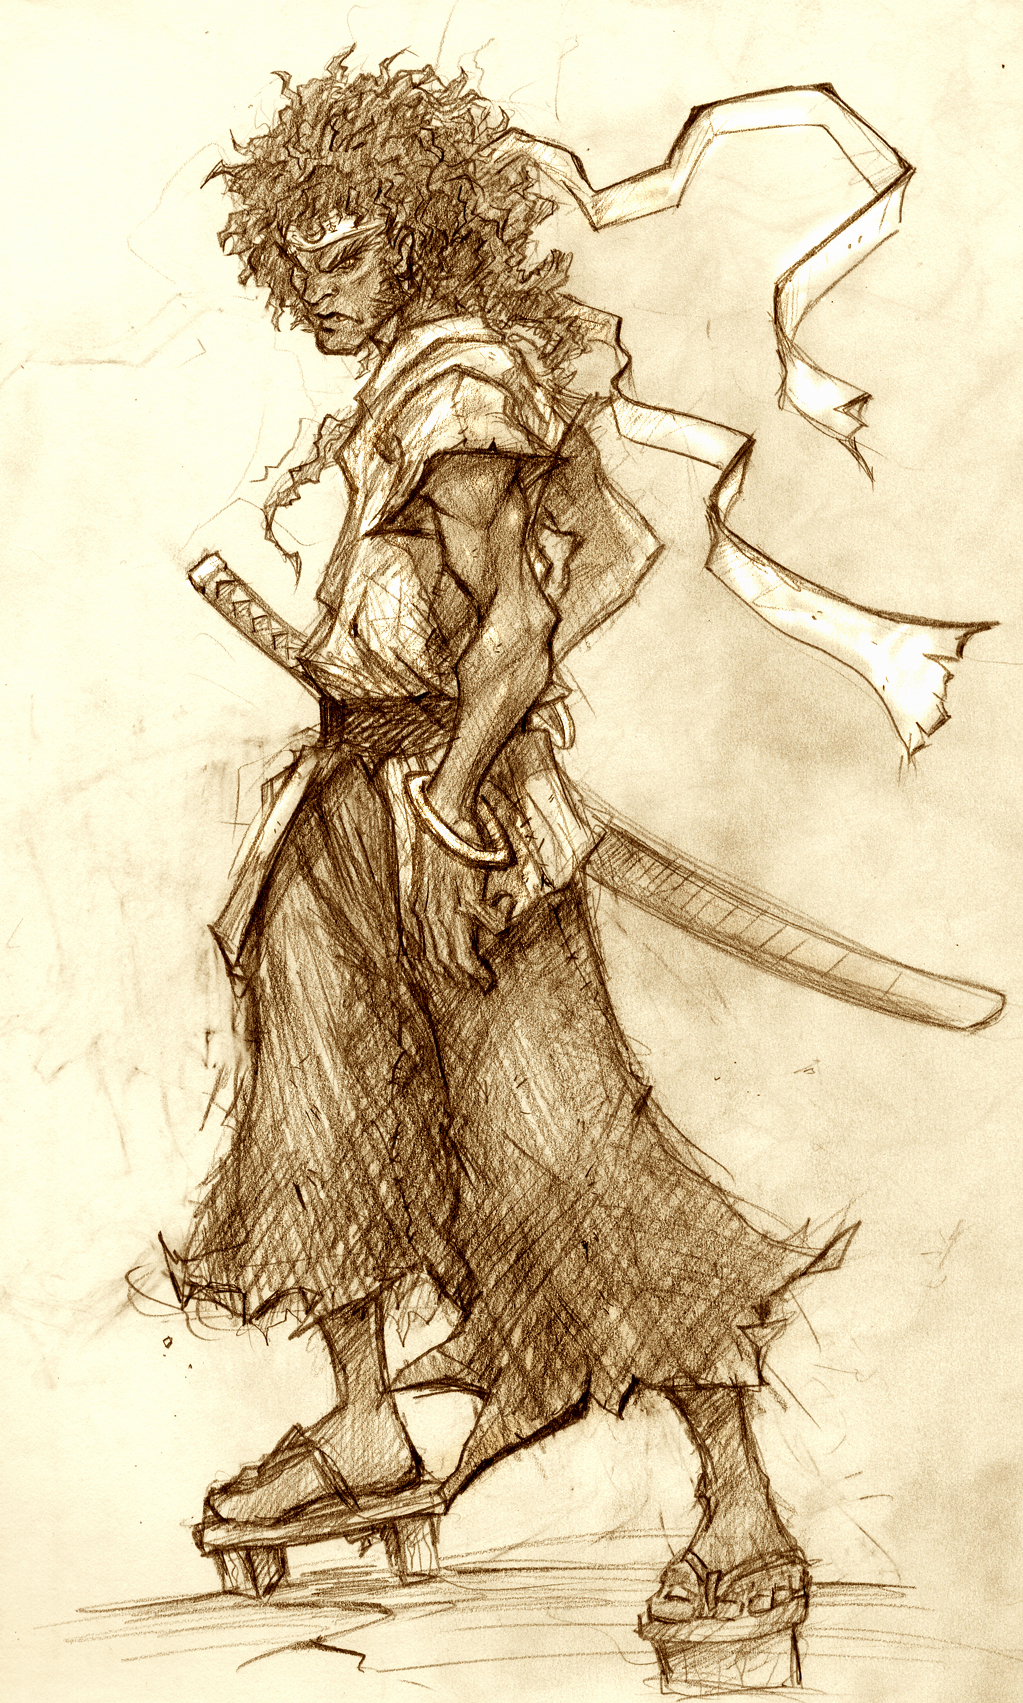 Afro Samurai Wallpaper on Afro Samurai Hd Wallpaper   General   324316